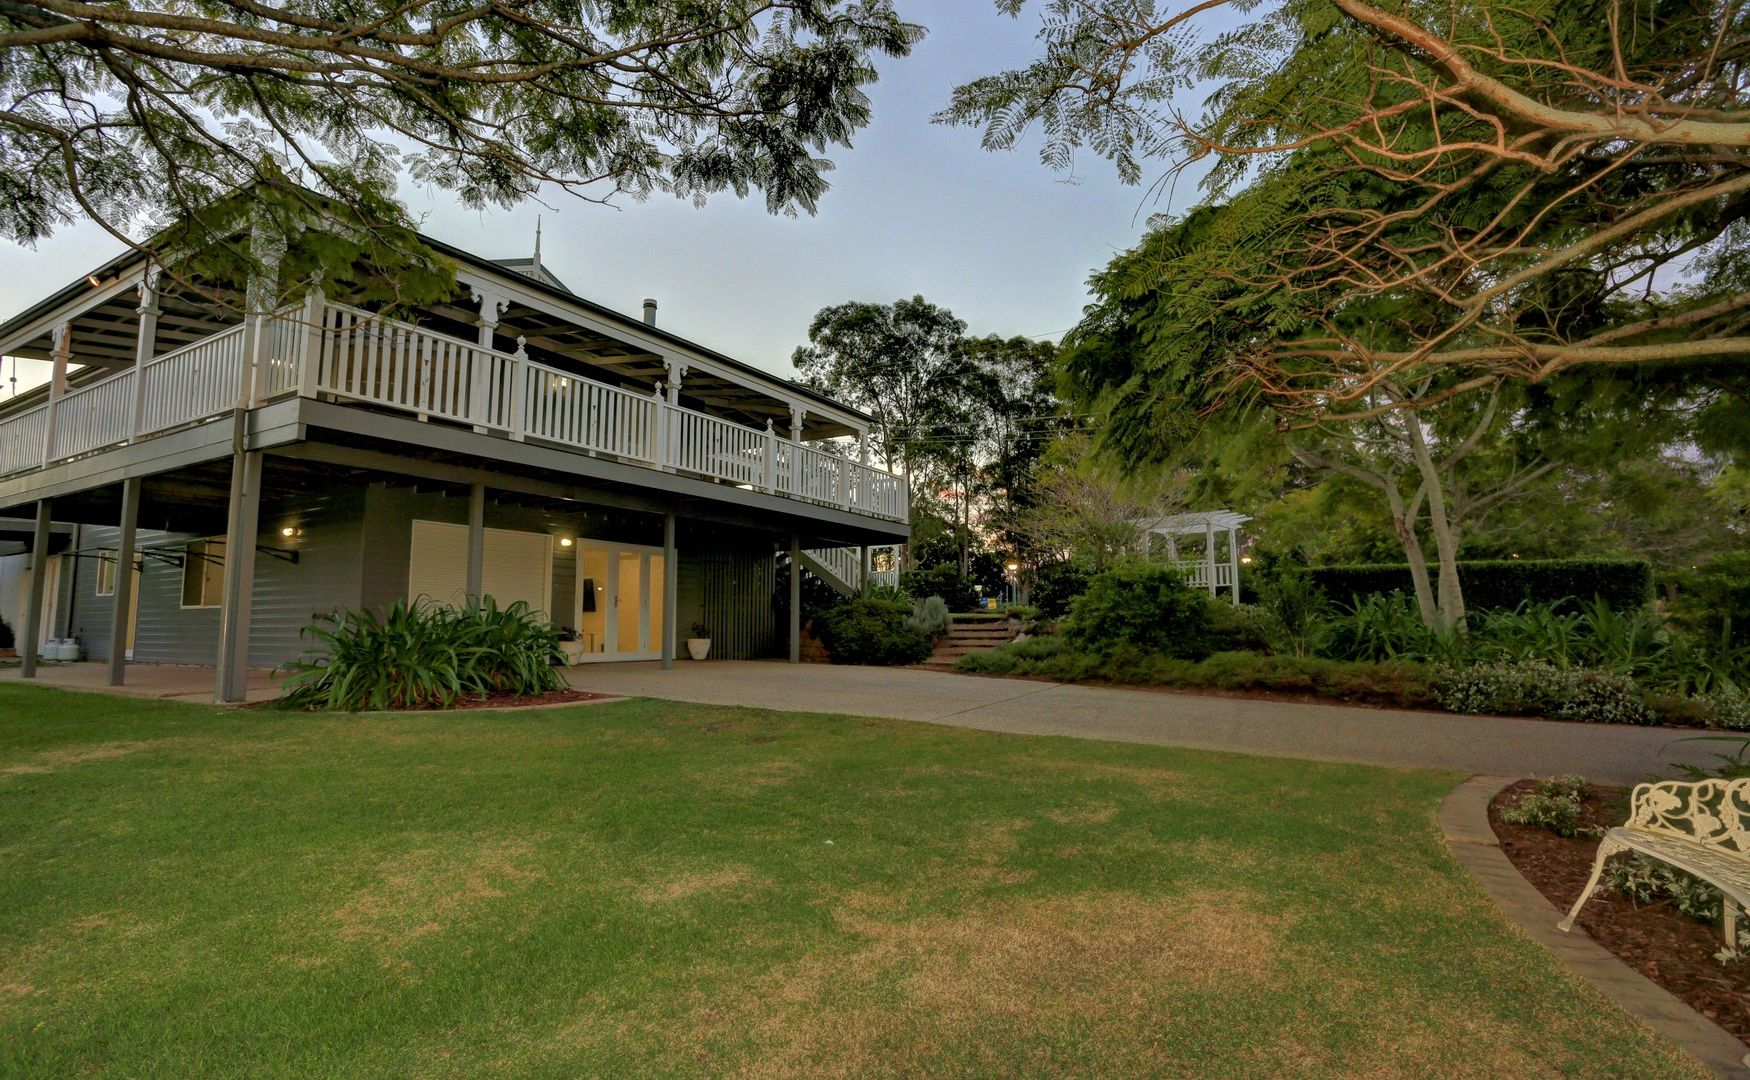 30 Thornhill Street, Bundaberg North QLD 4670, Image 1